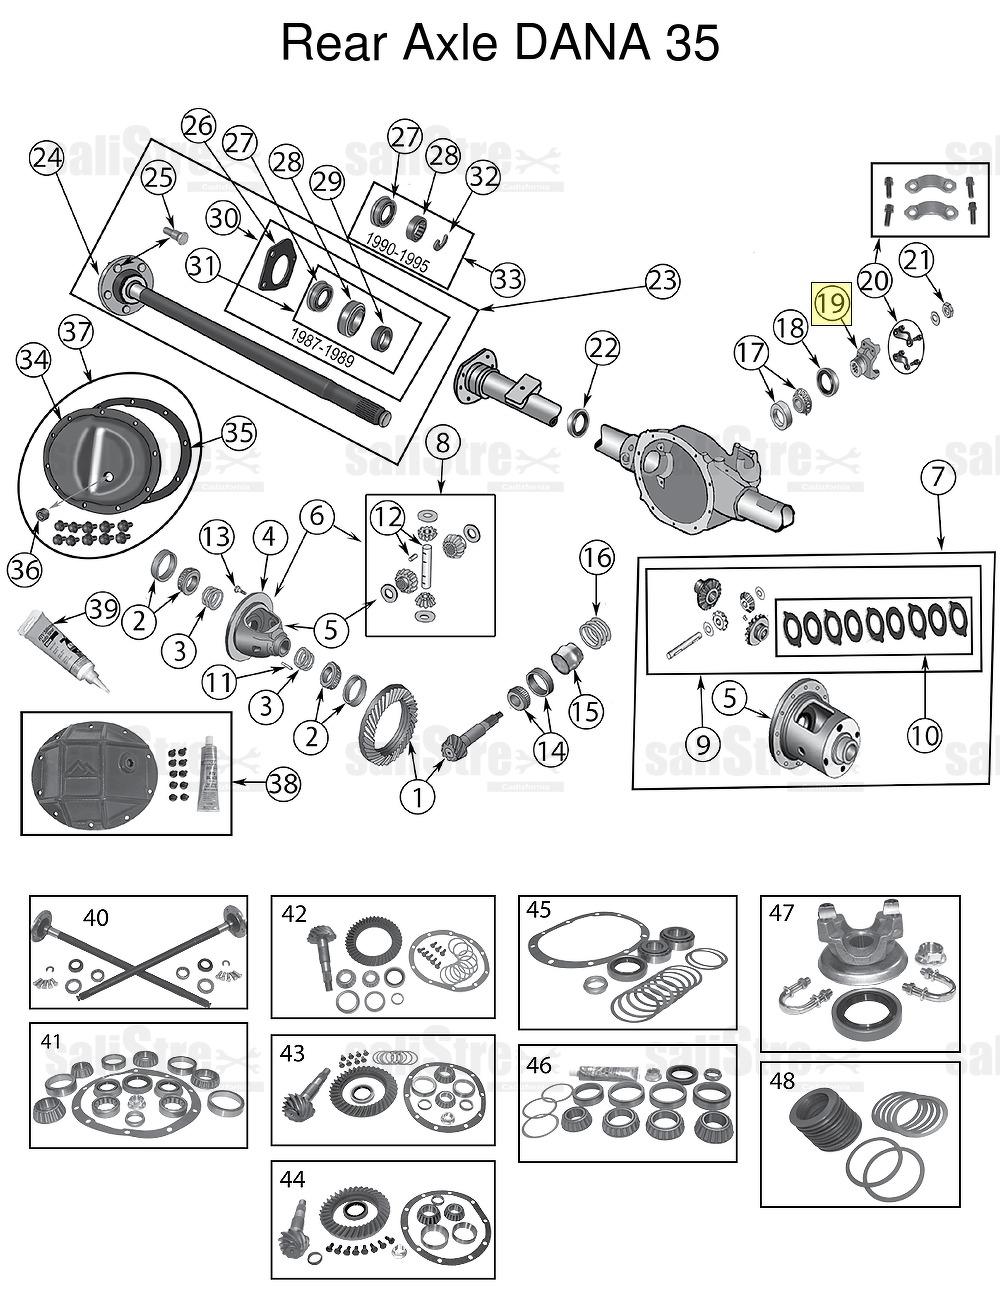 Ingresso o uscita Yoke Jeep Wrangler YJ 1993/1995 (2.5 L 4 ...